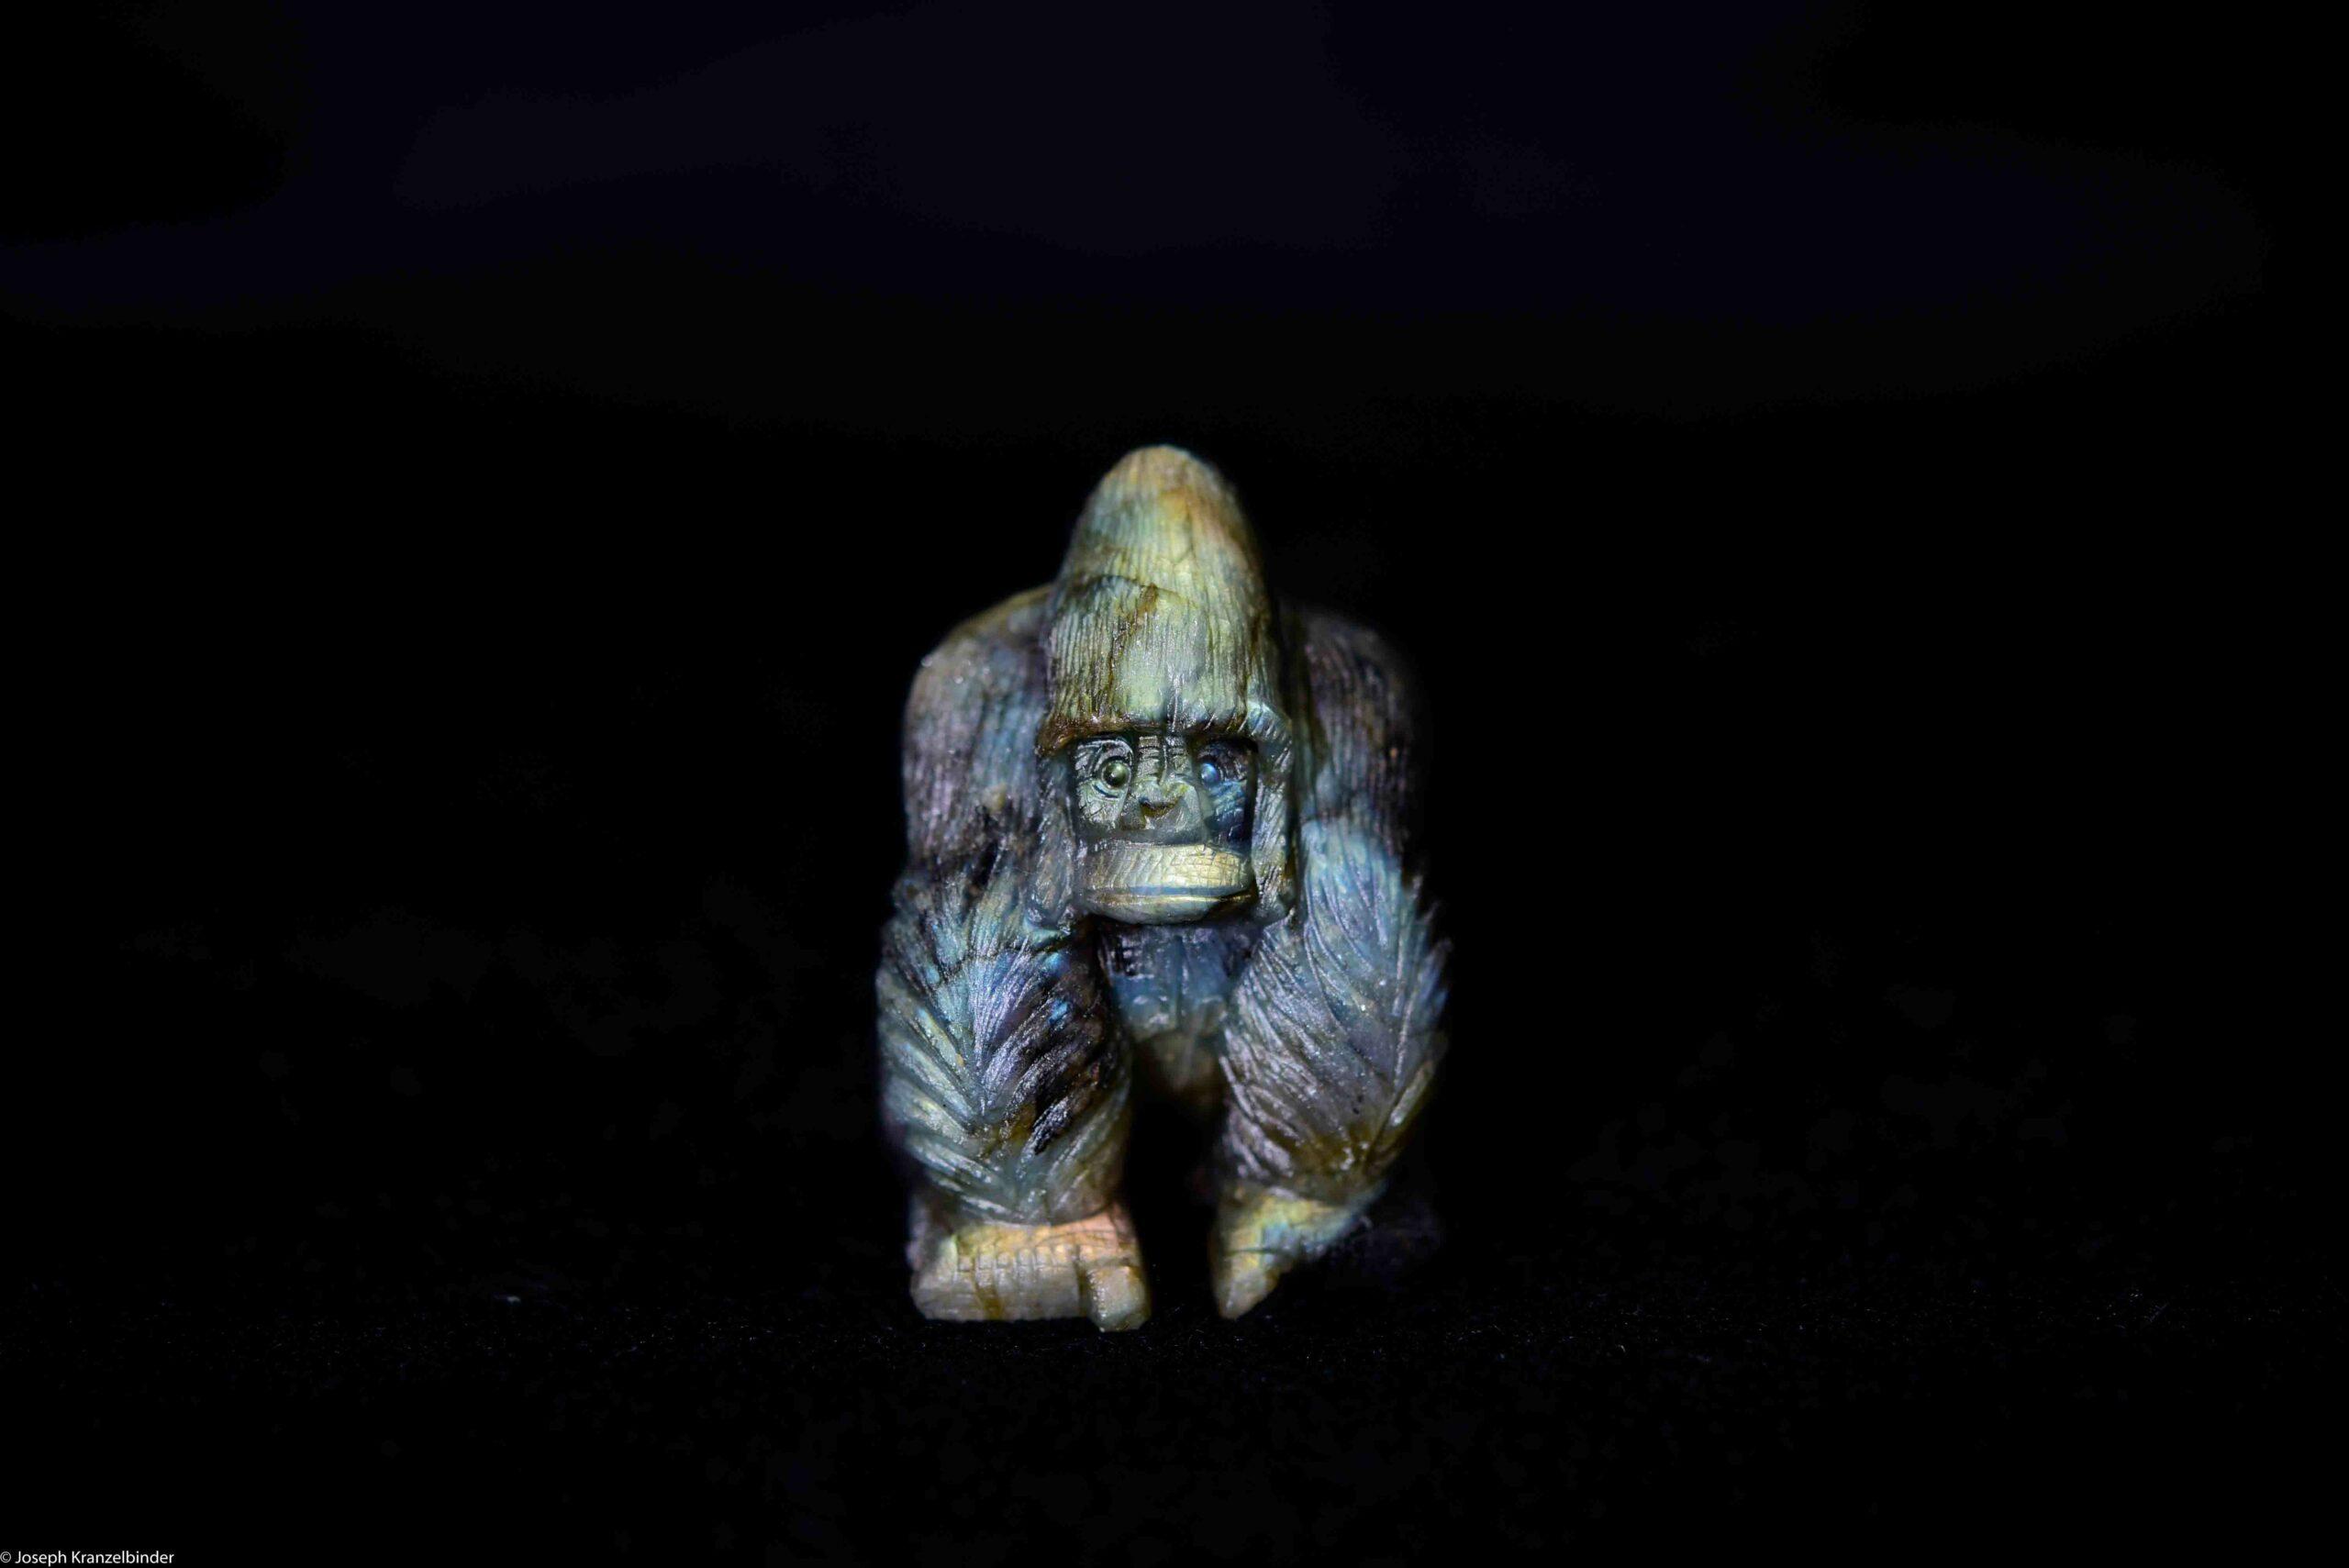 Gravur Labradorit Gorilla Handarbeit